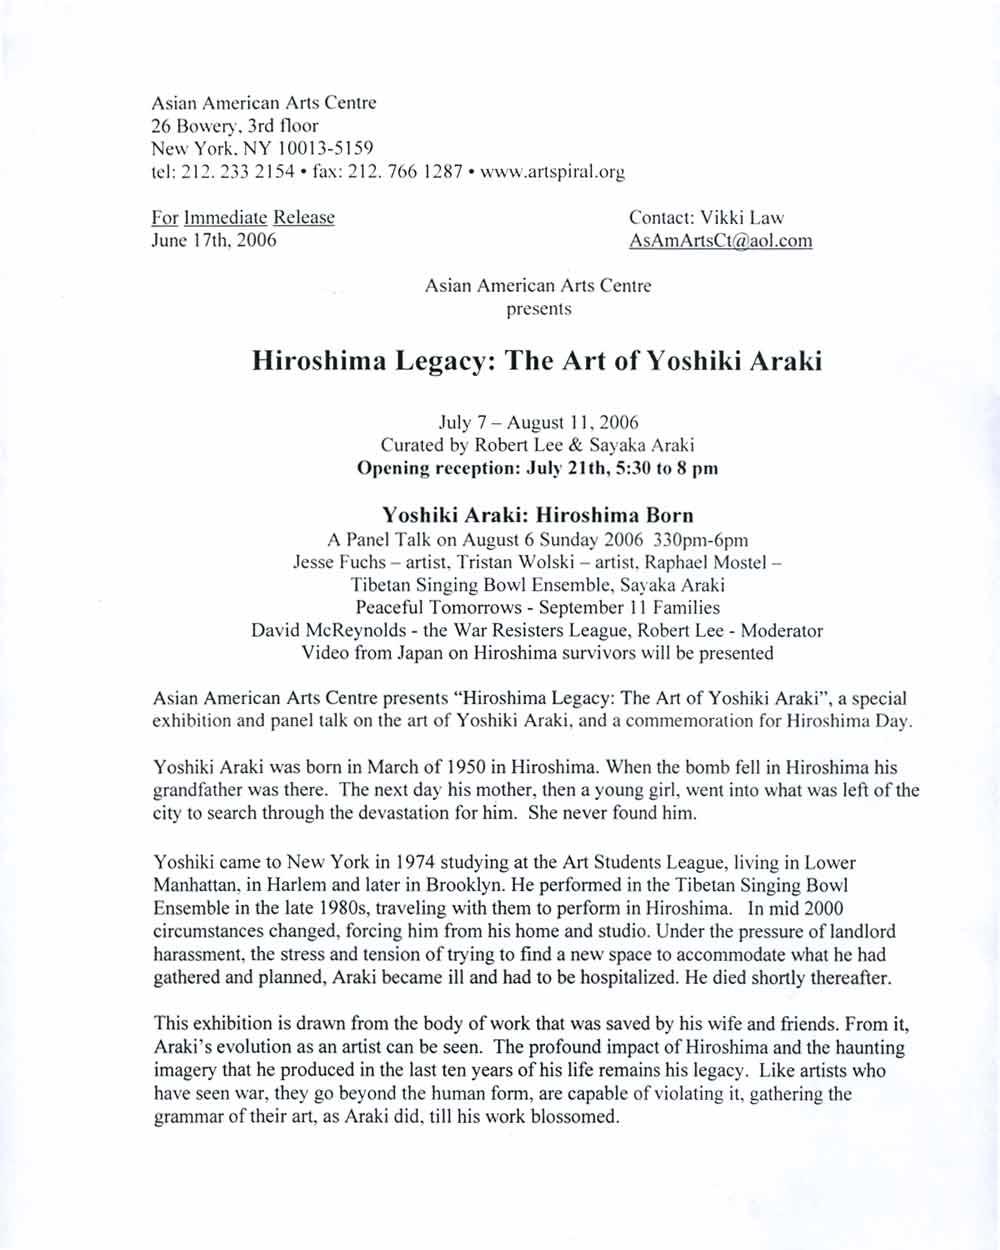 Hiroshima Born press release, pg 1